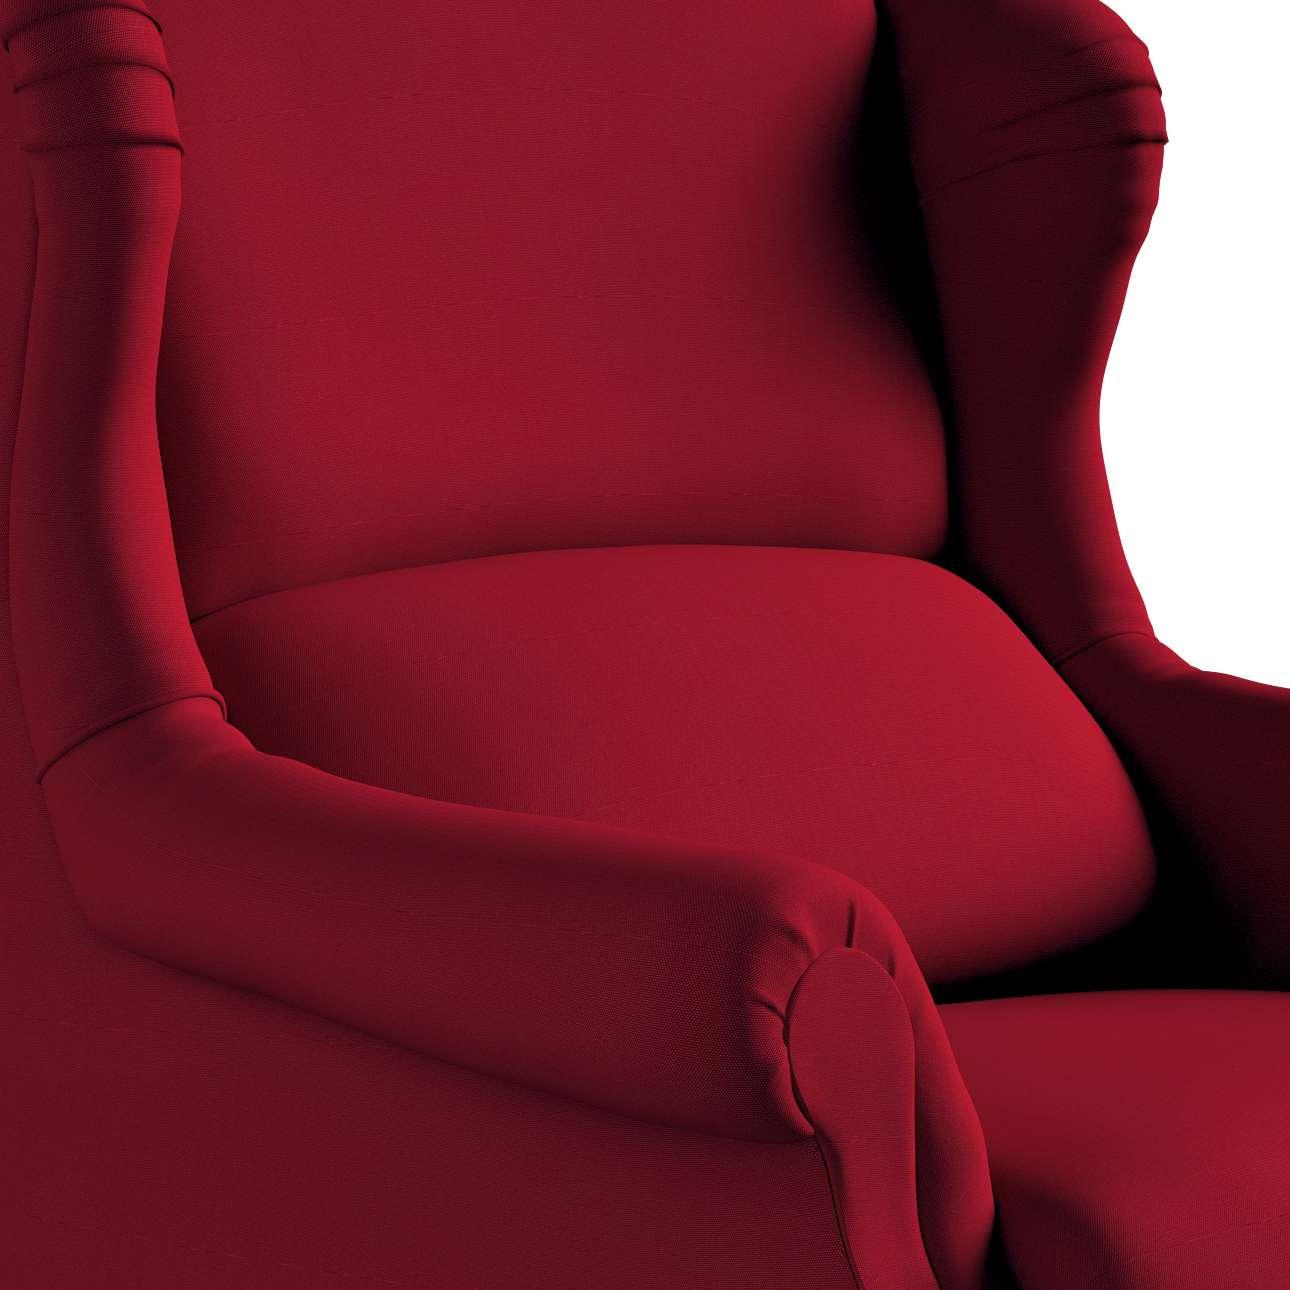 Stilingas Dekoria fotelis 63 x 115 cm kolekcijoje Etna , audinys: 705-60